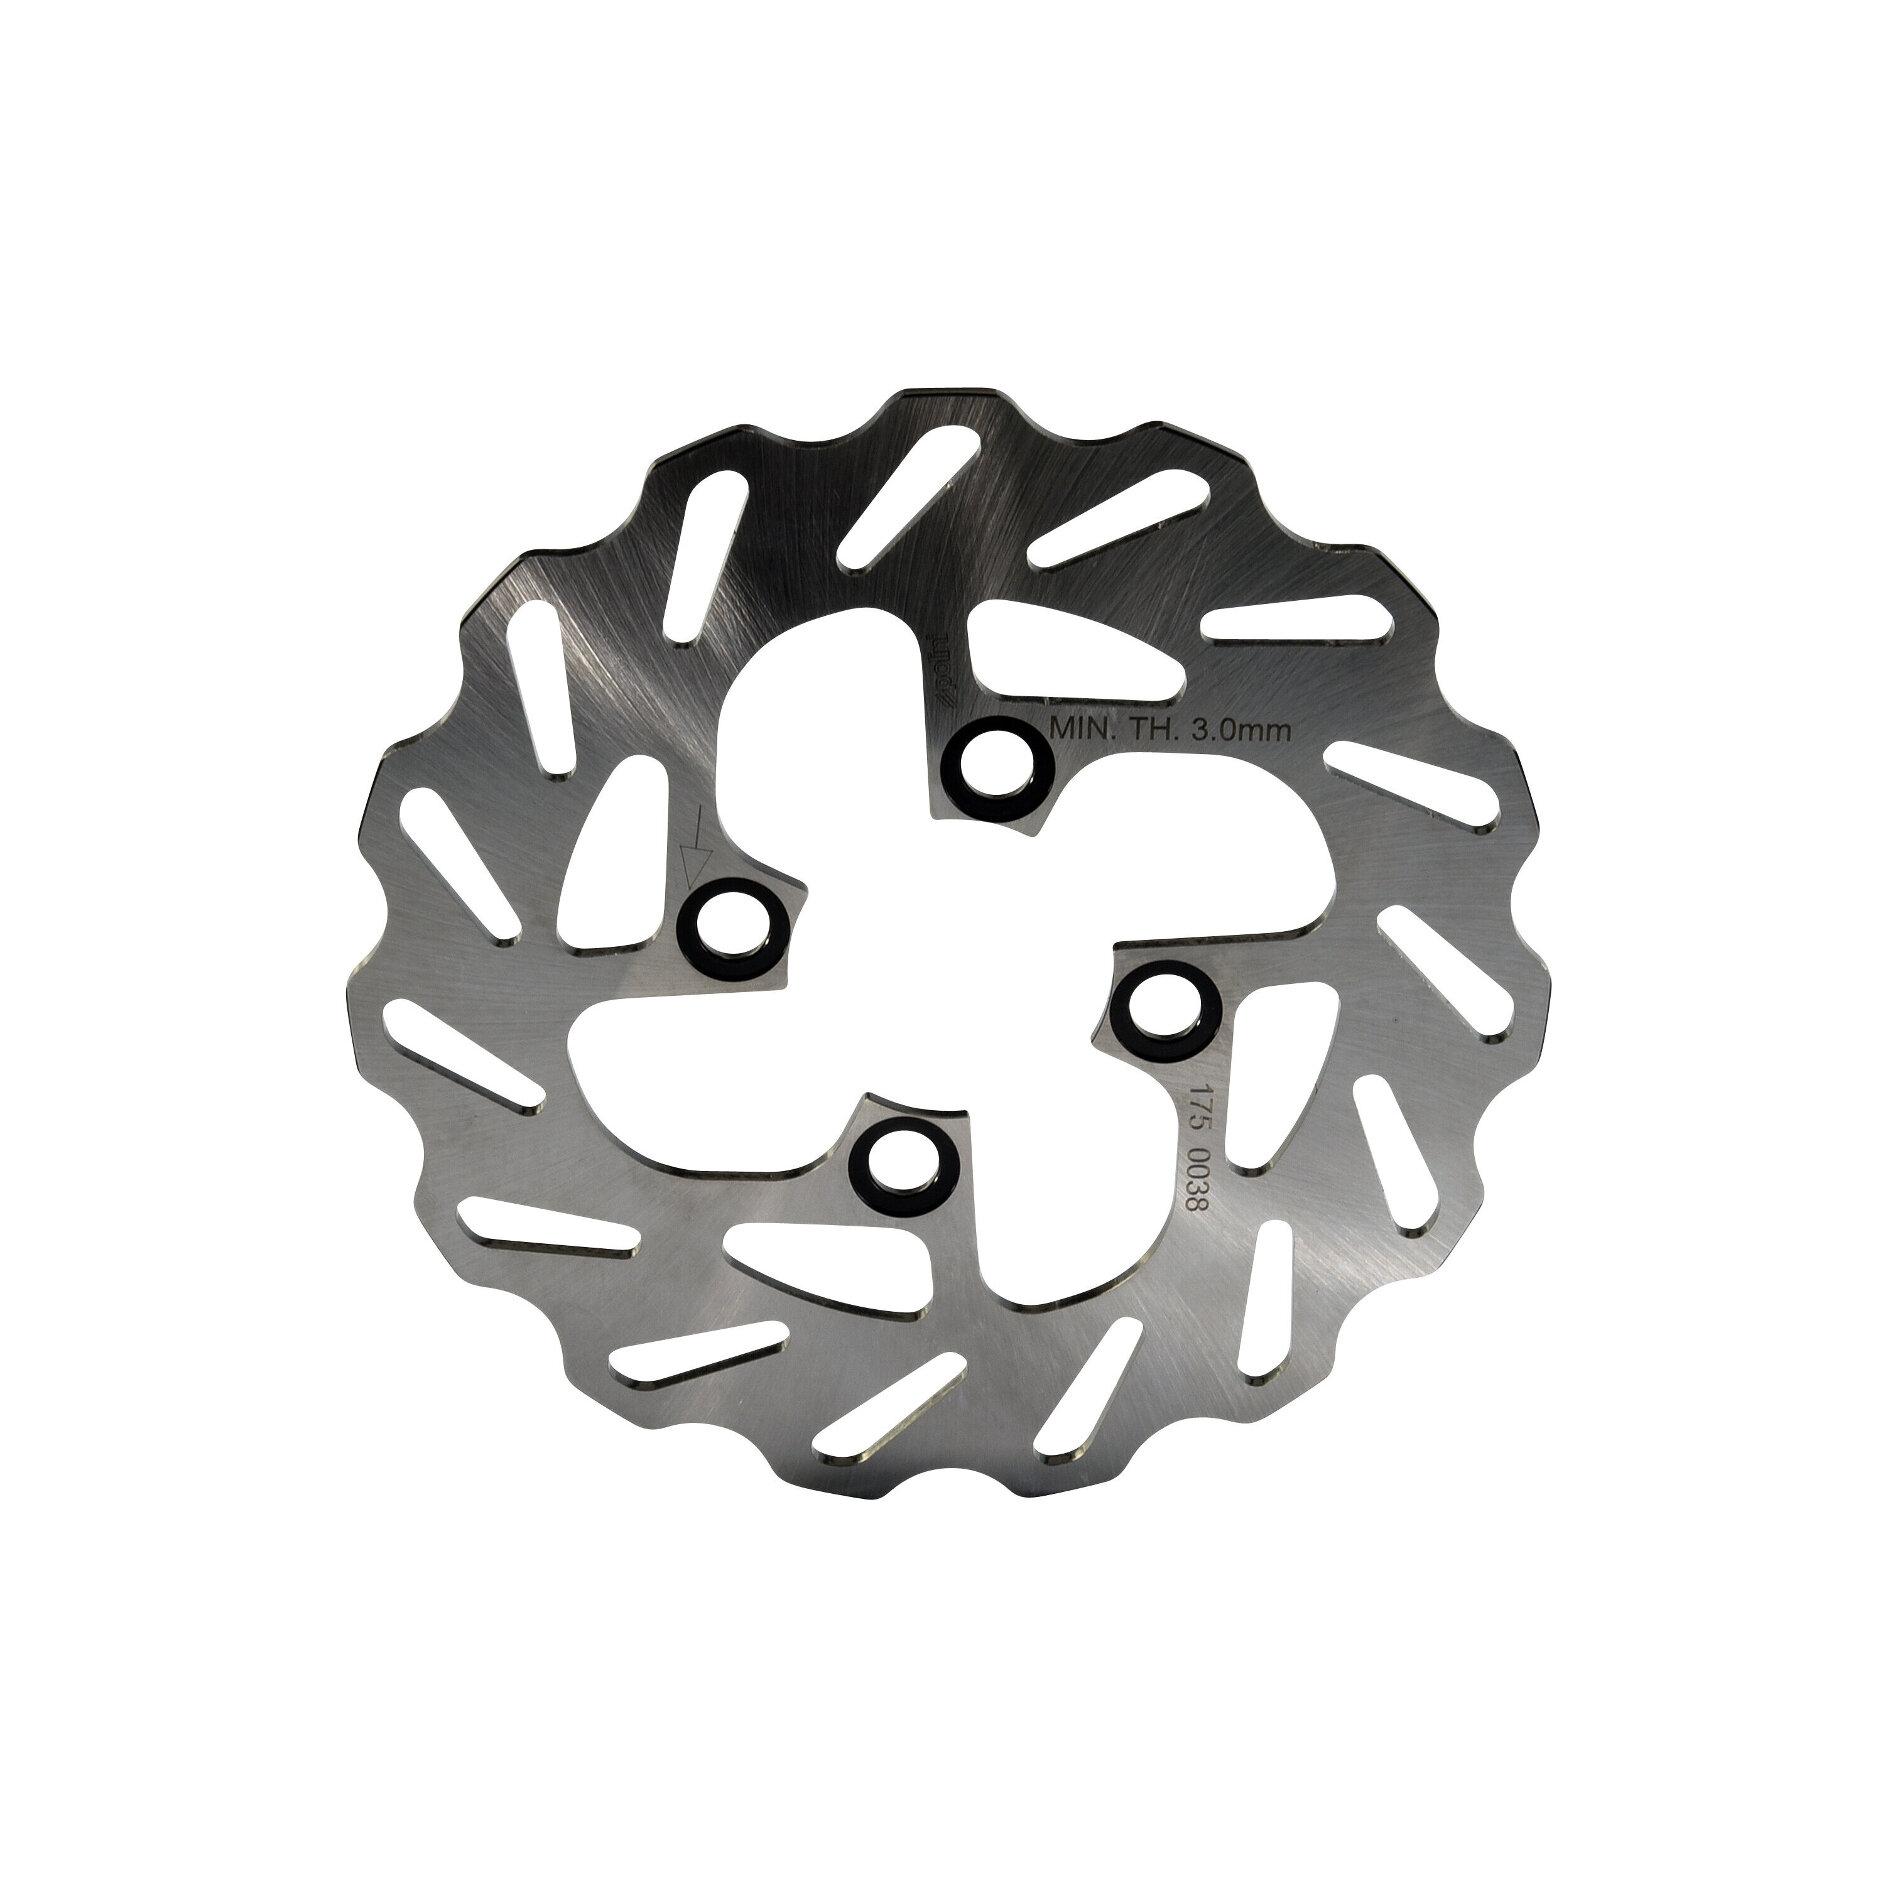 Disque de frein Polini MBK Booster / Yamaha BW'S